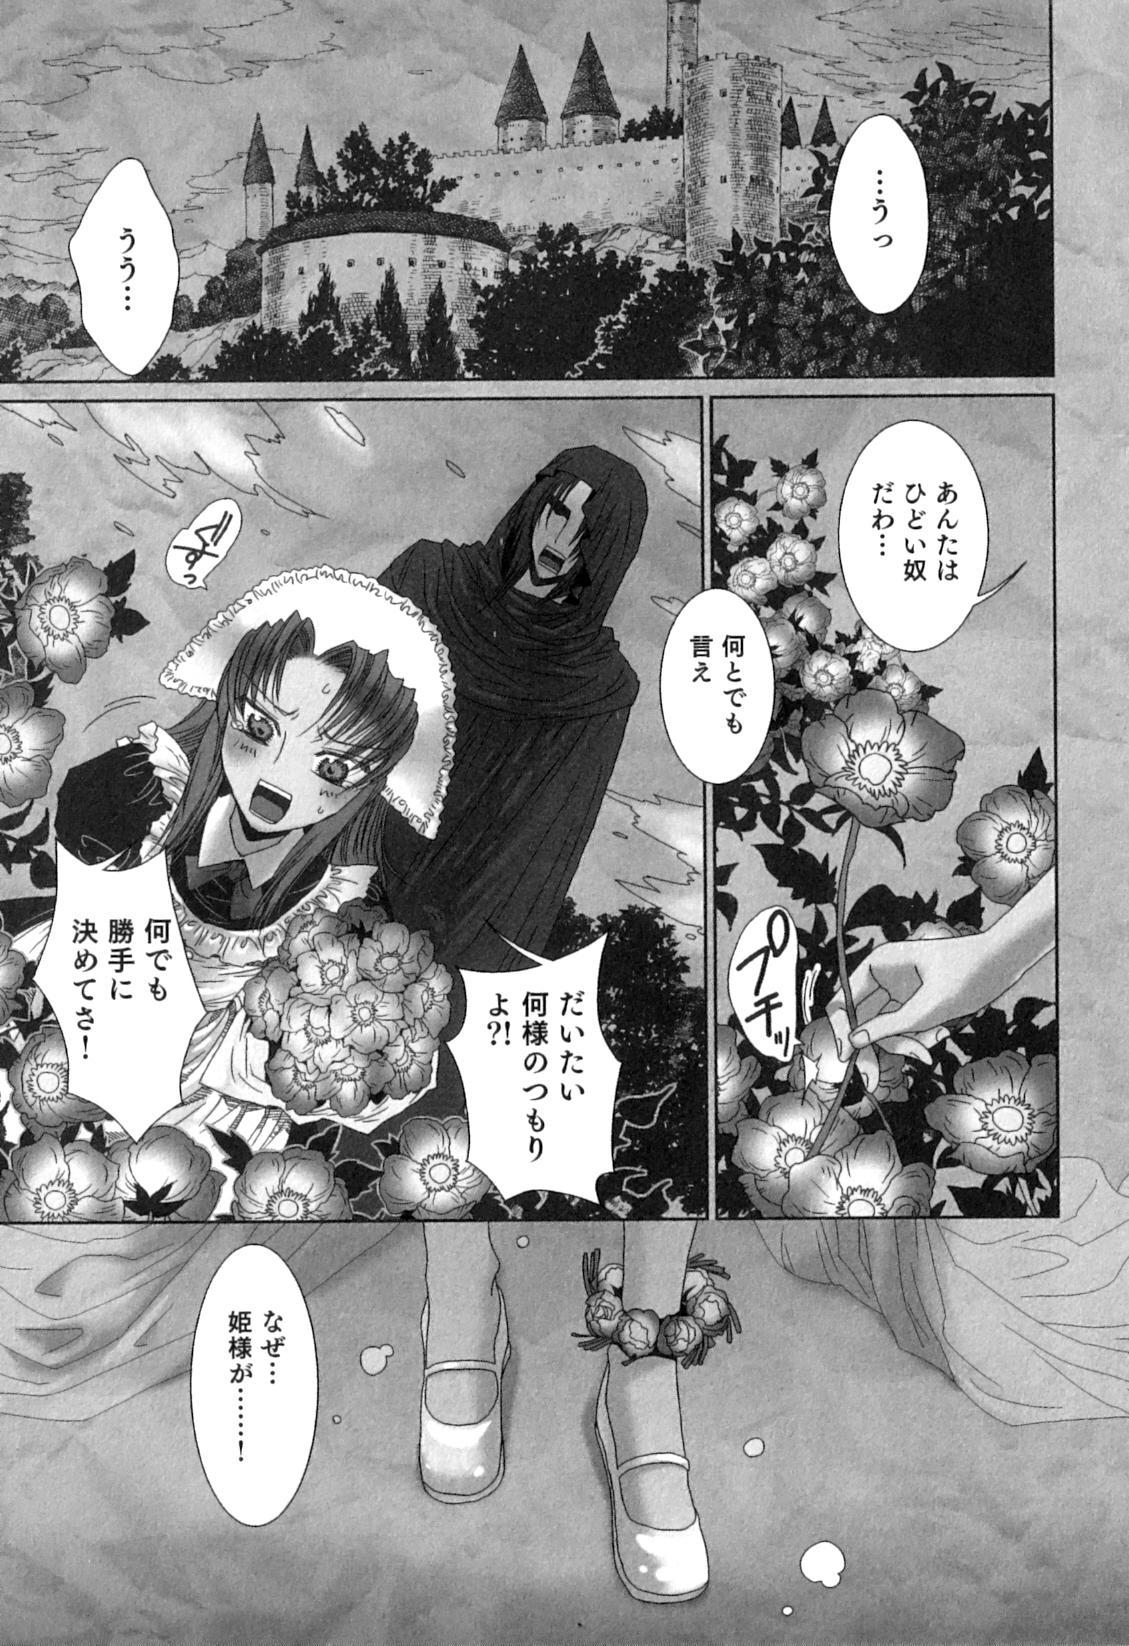 Yuni-Hapi 159